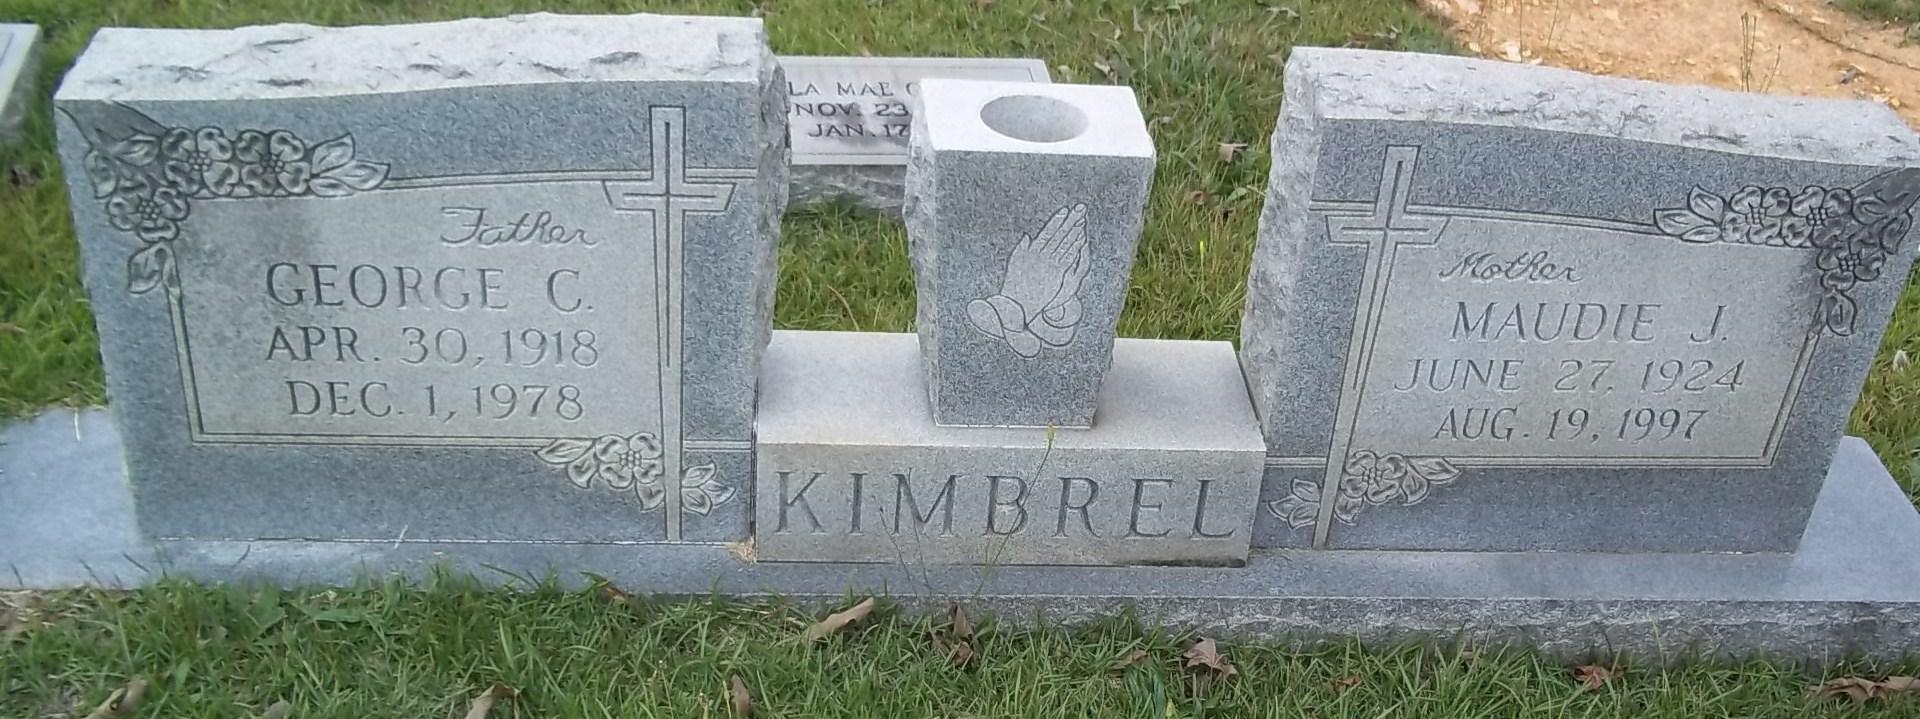 Maudie J. Kimbrel